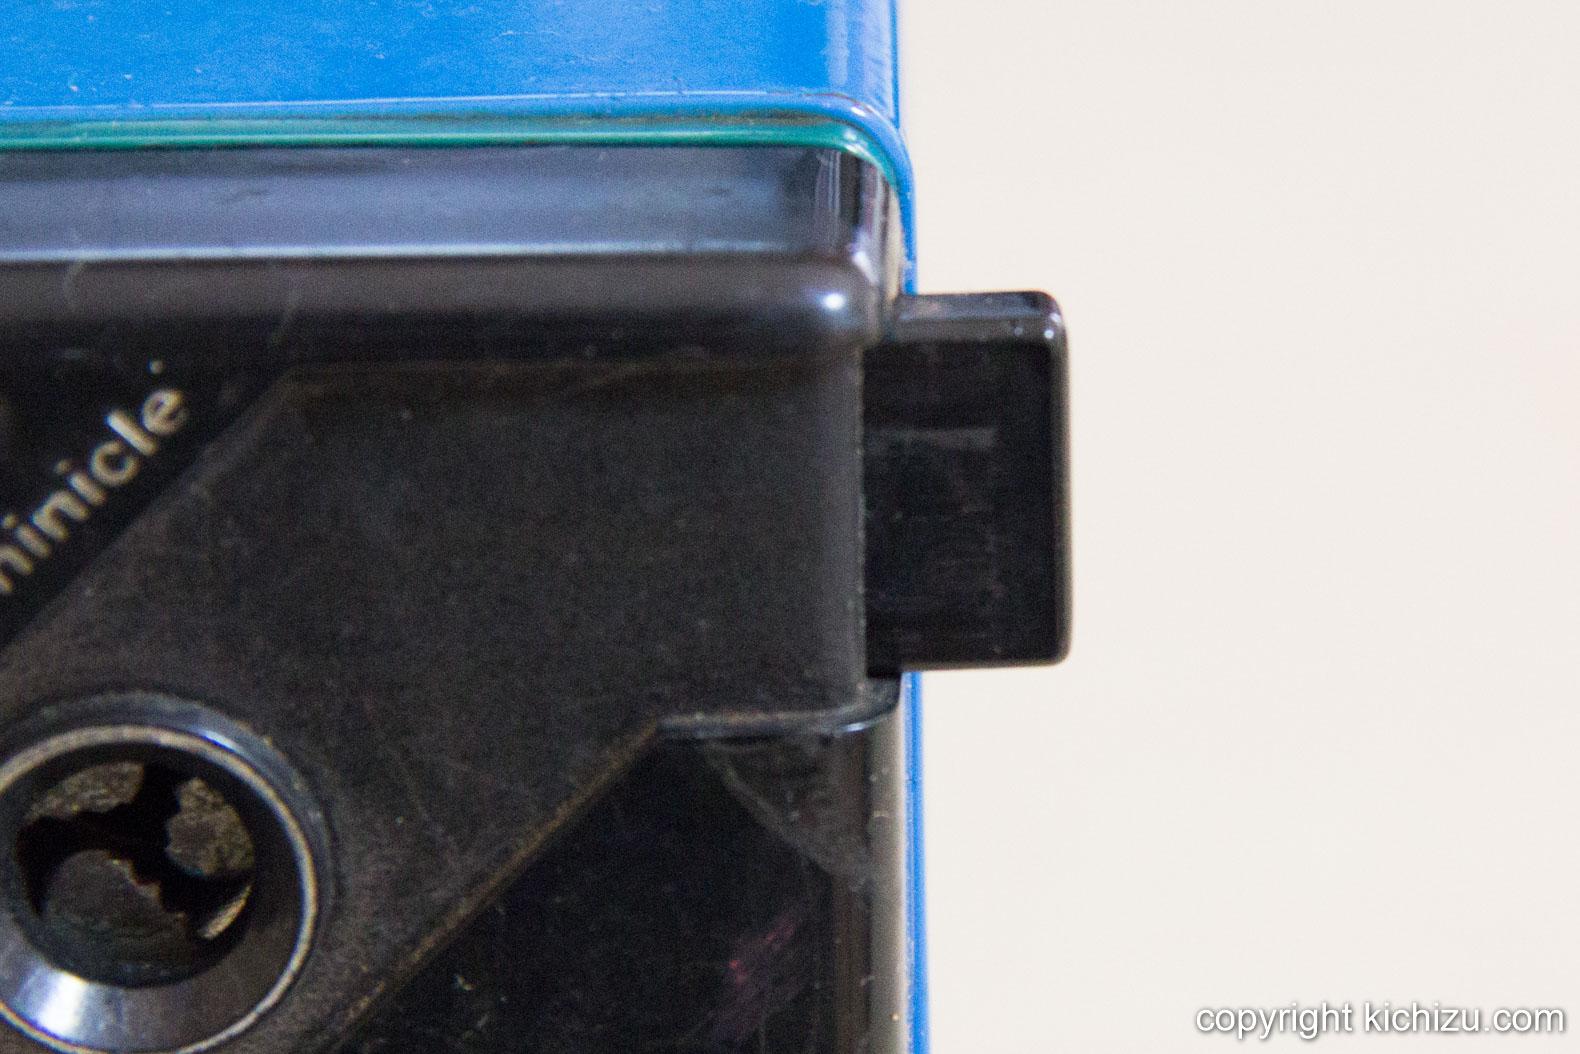 CARL 鉛筆削り CP-80 のボタン